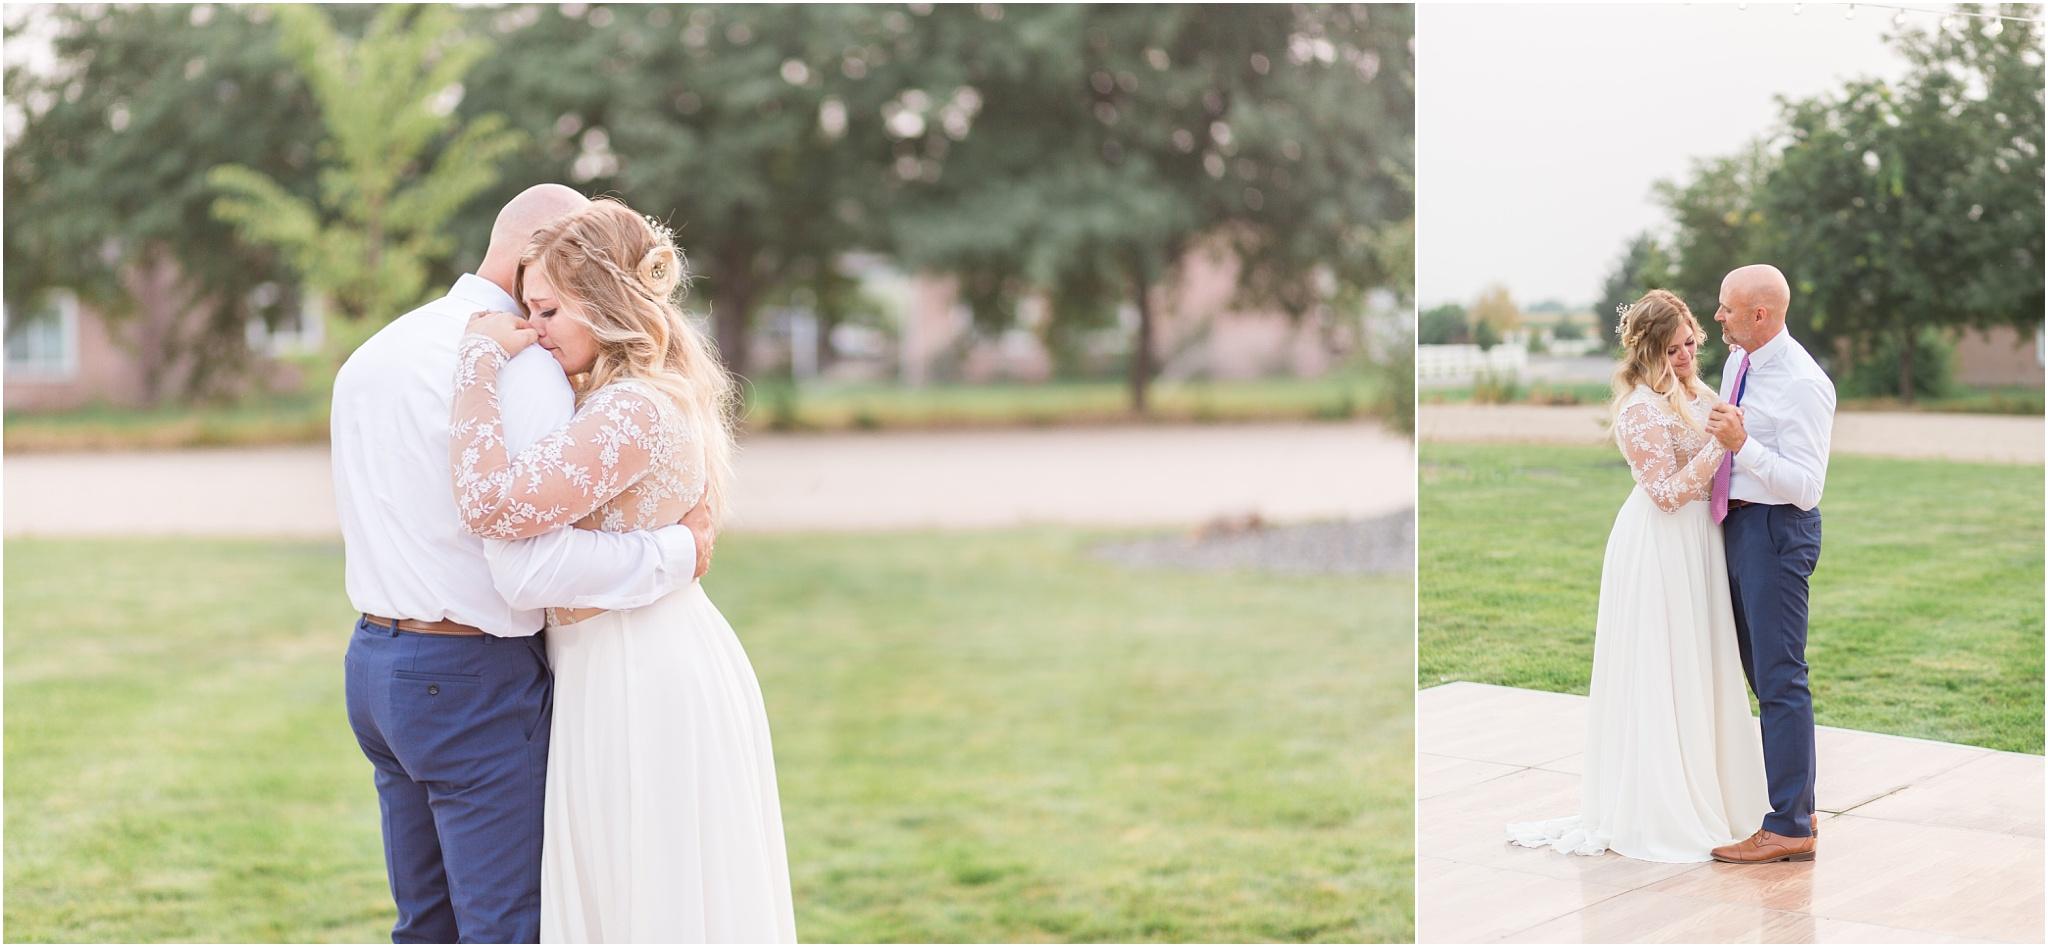 Wedding Photography_Meridian Idaho Temple_Boise Idaho_Nampa Idaho_Leah Southwick Photography_0057.jpg